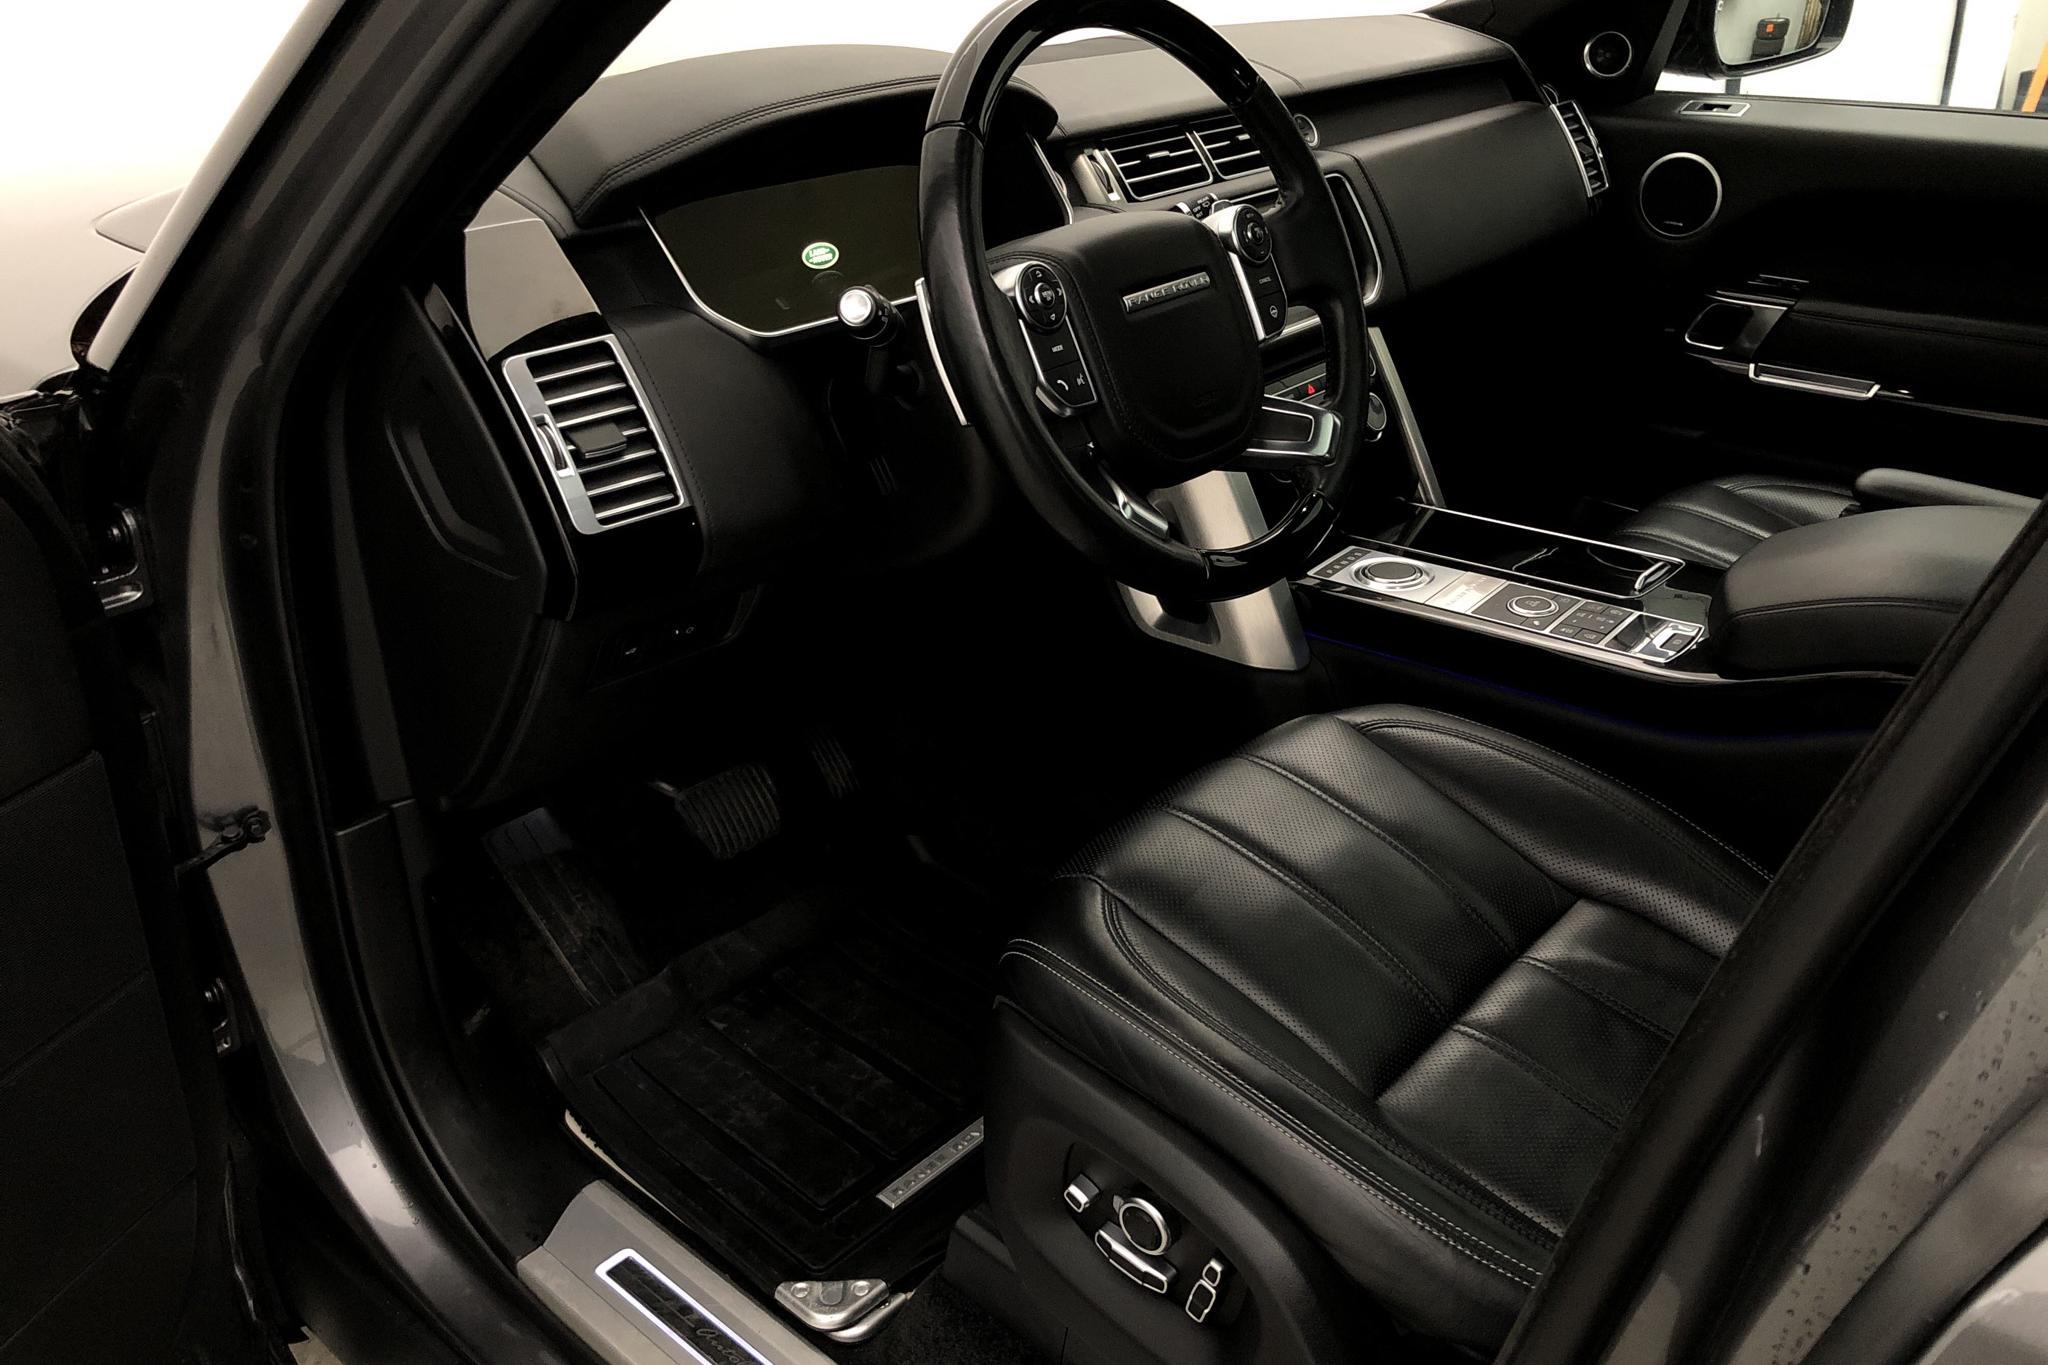 Land Rover Range Rover 4.4 SDV8 AWD (339hk) - 8 726 mil - Automat - grå - 2016